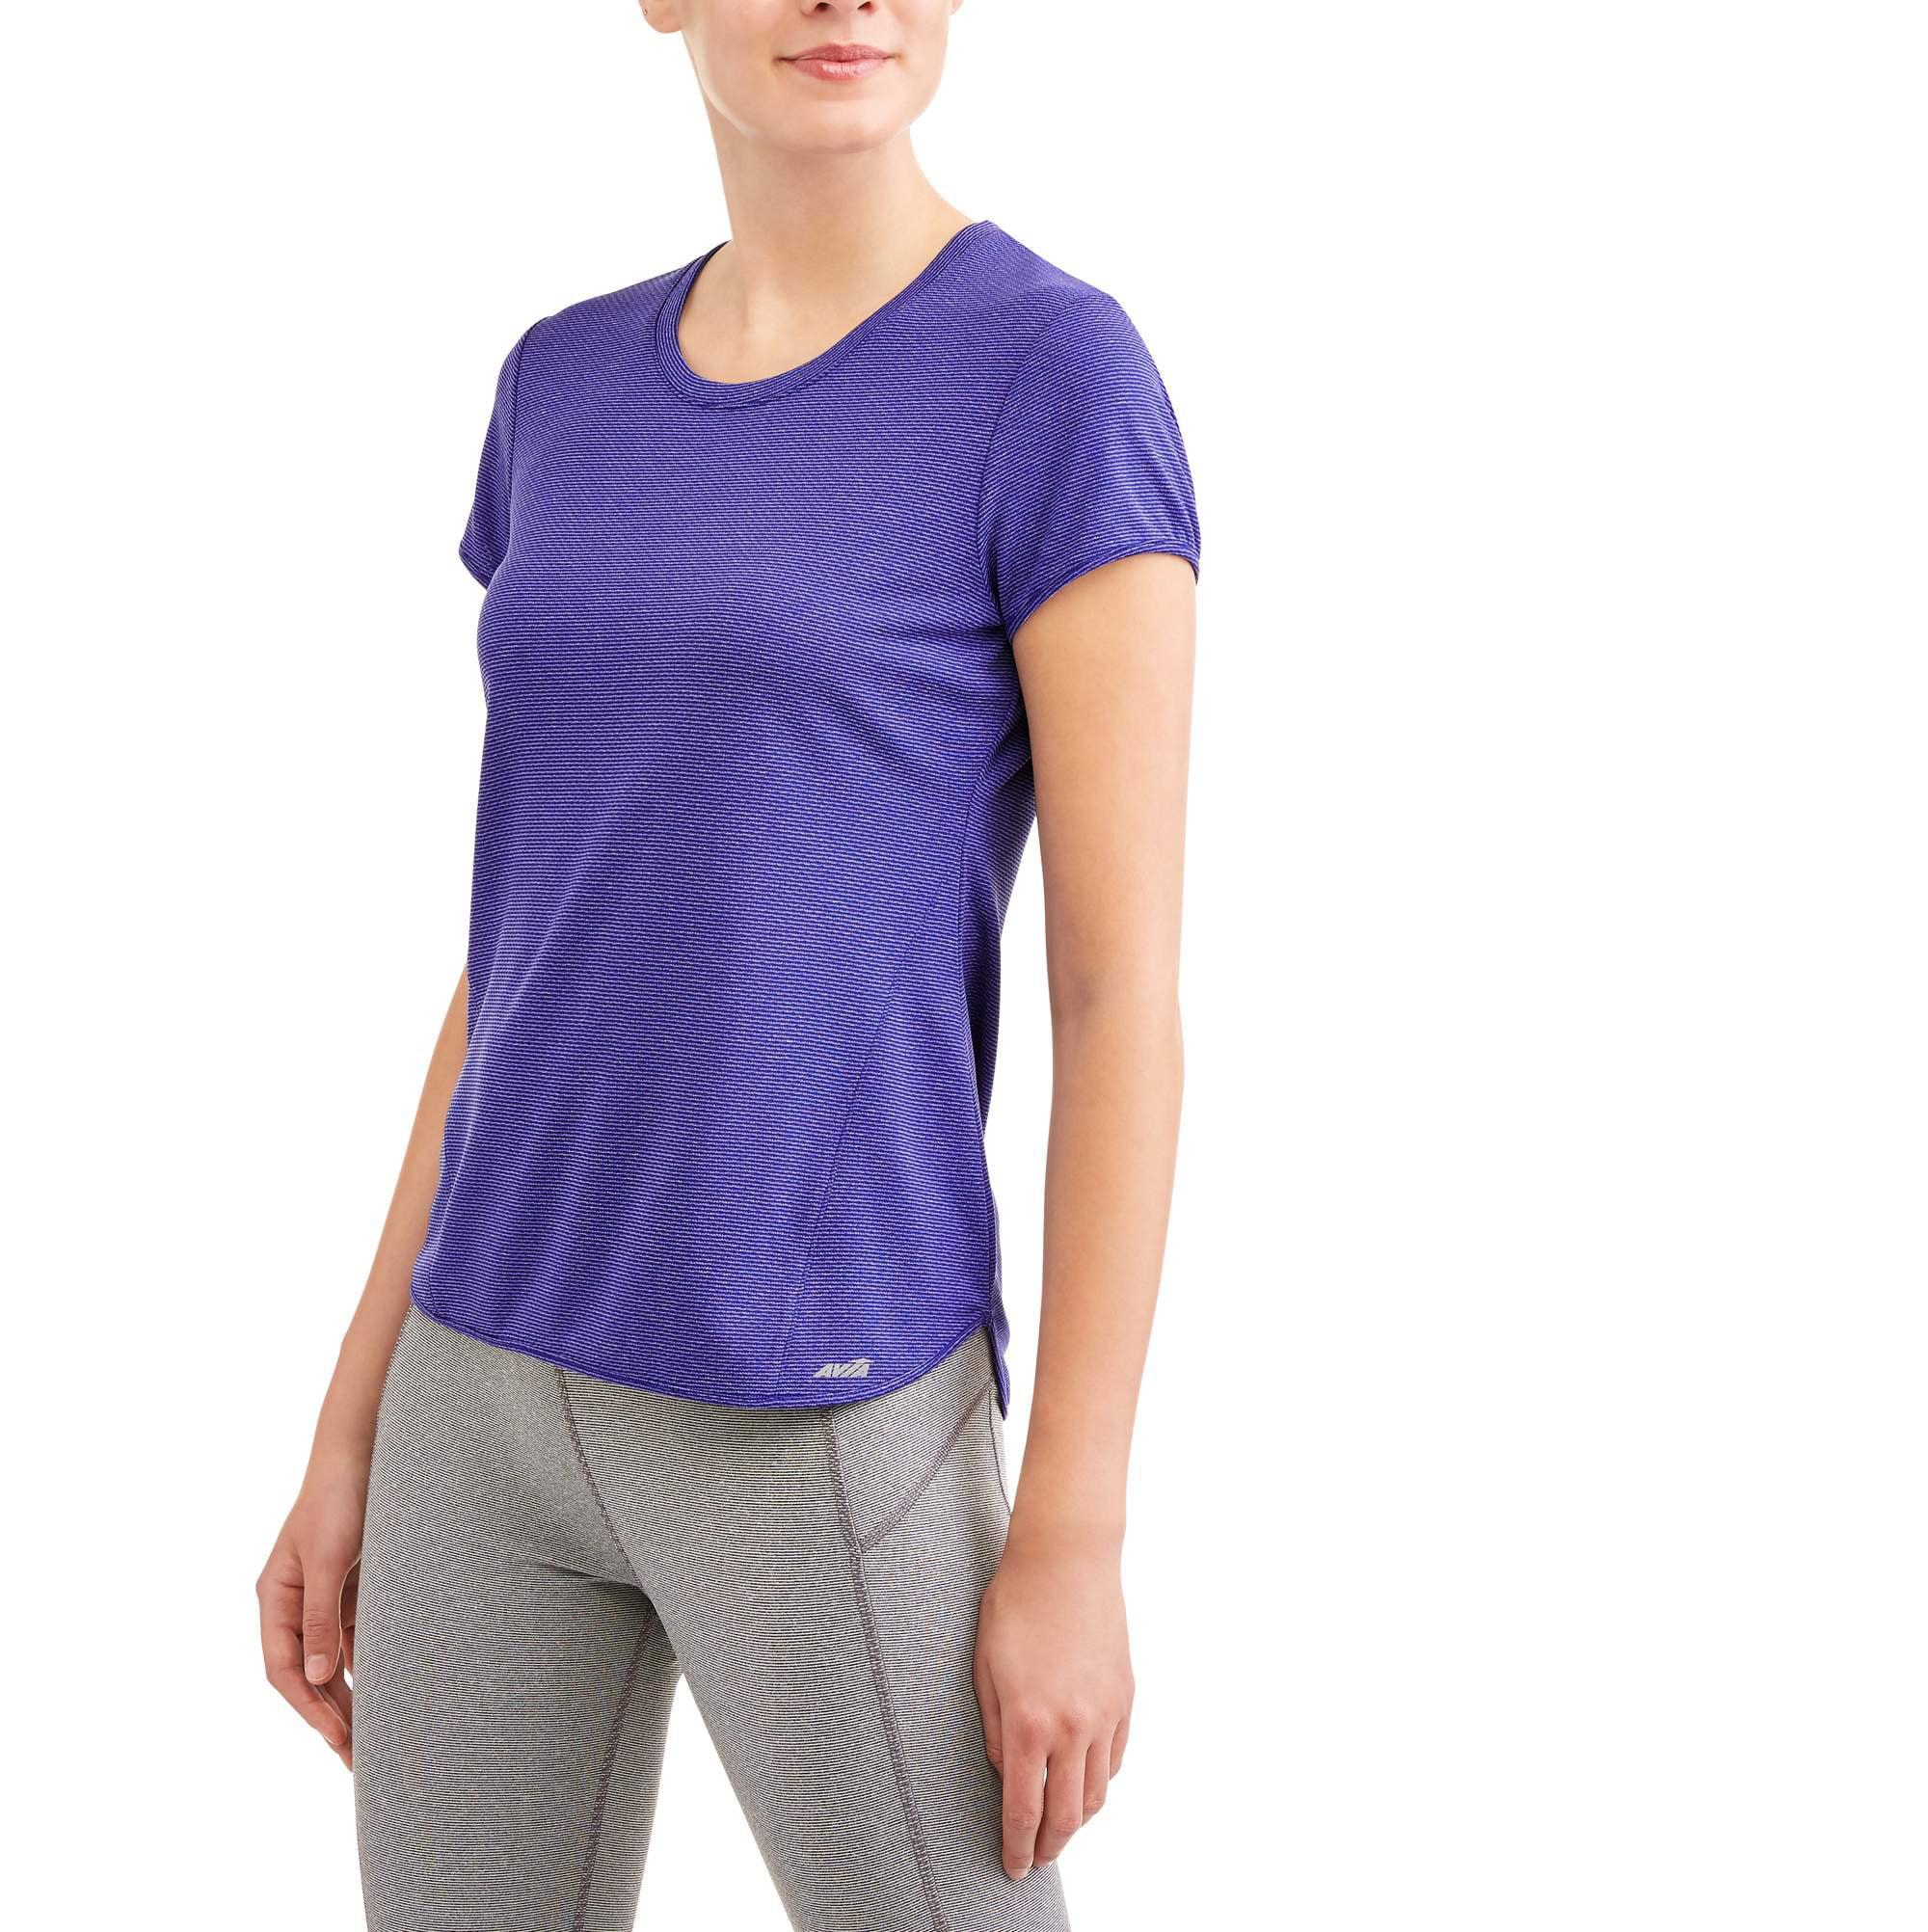 Avia Women's Active Short Sleeve Textured Performance T - Shirt With Moisture Wicking